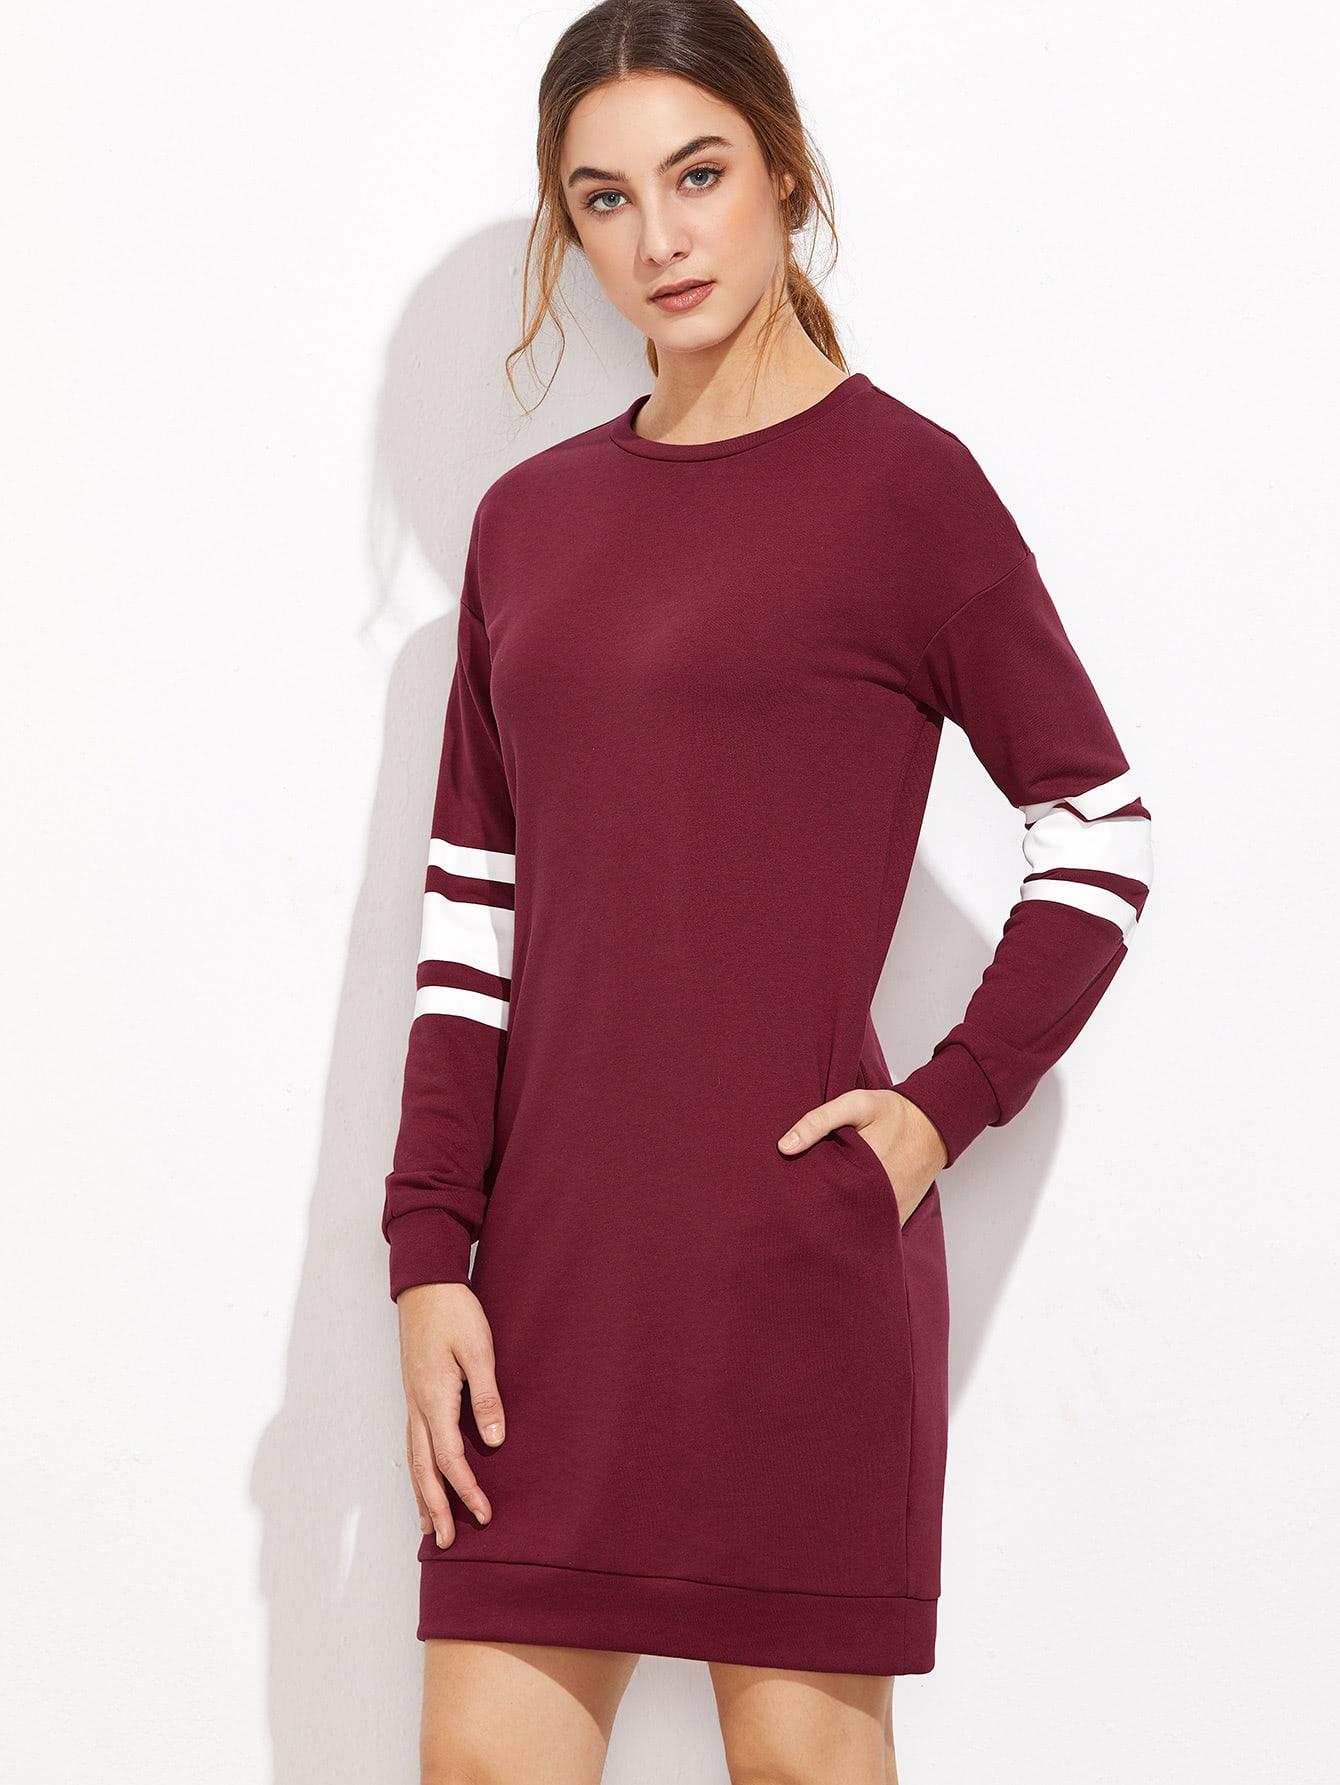 Burgundy Varsity Striped Sleeve Sweatshirt Dress dress161101709